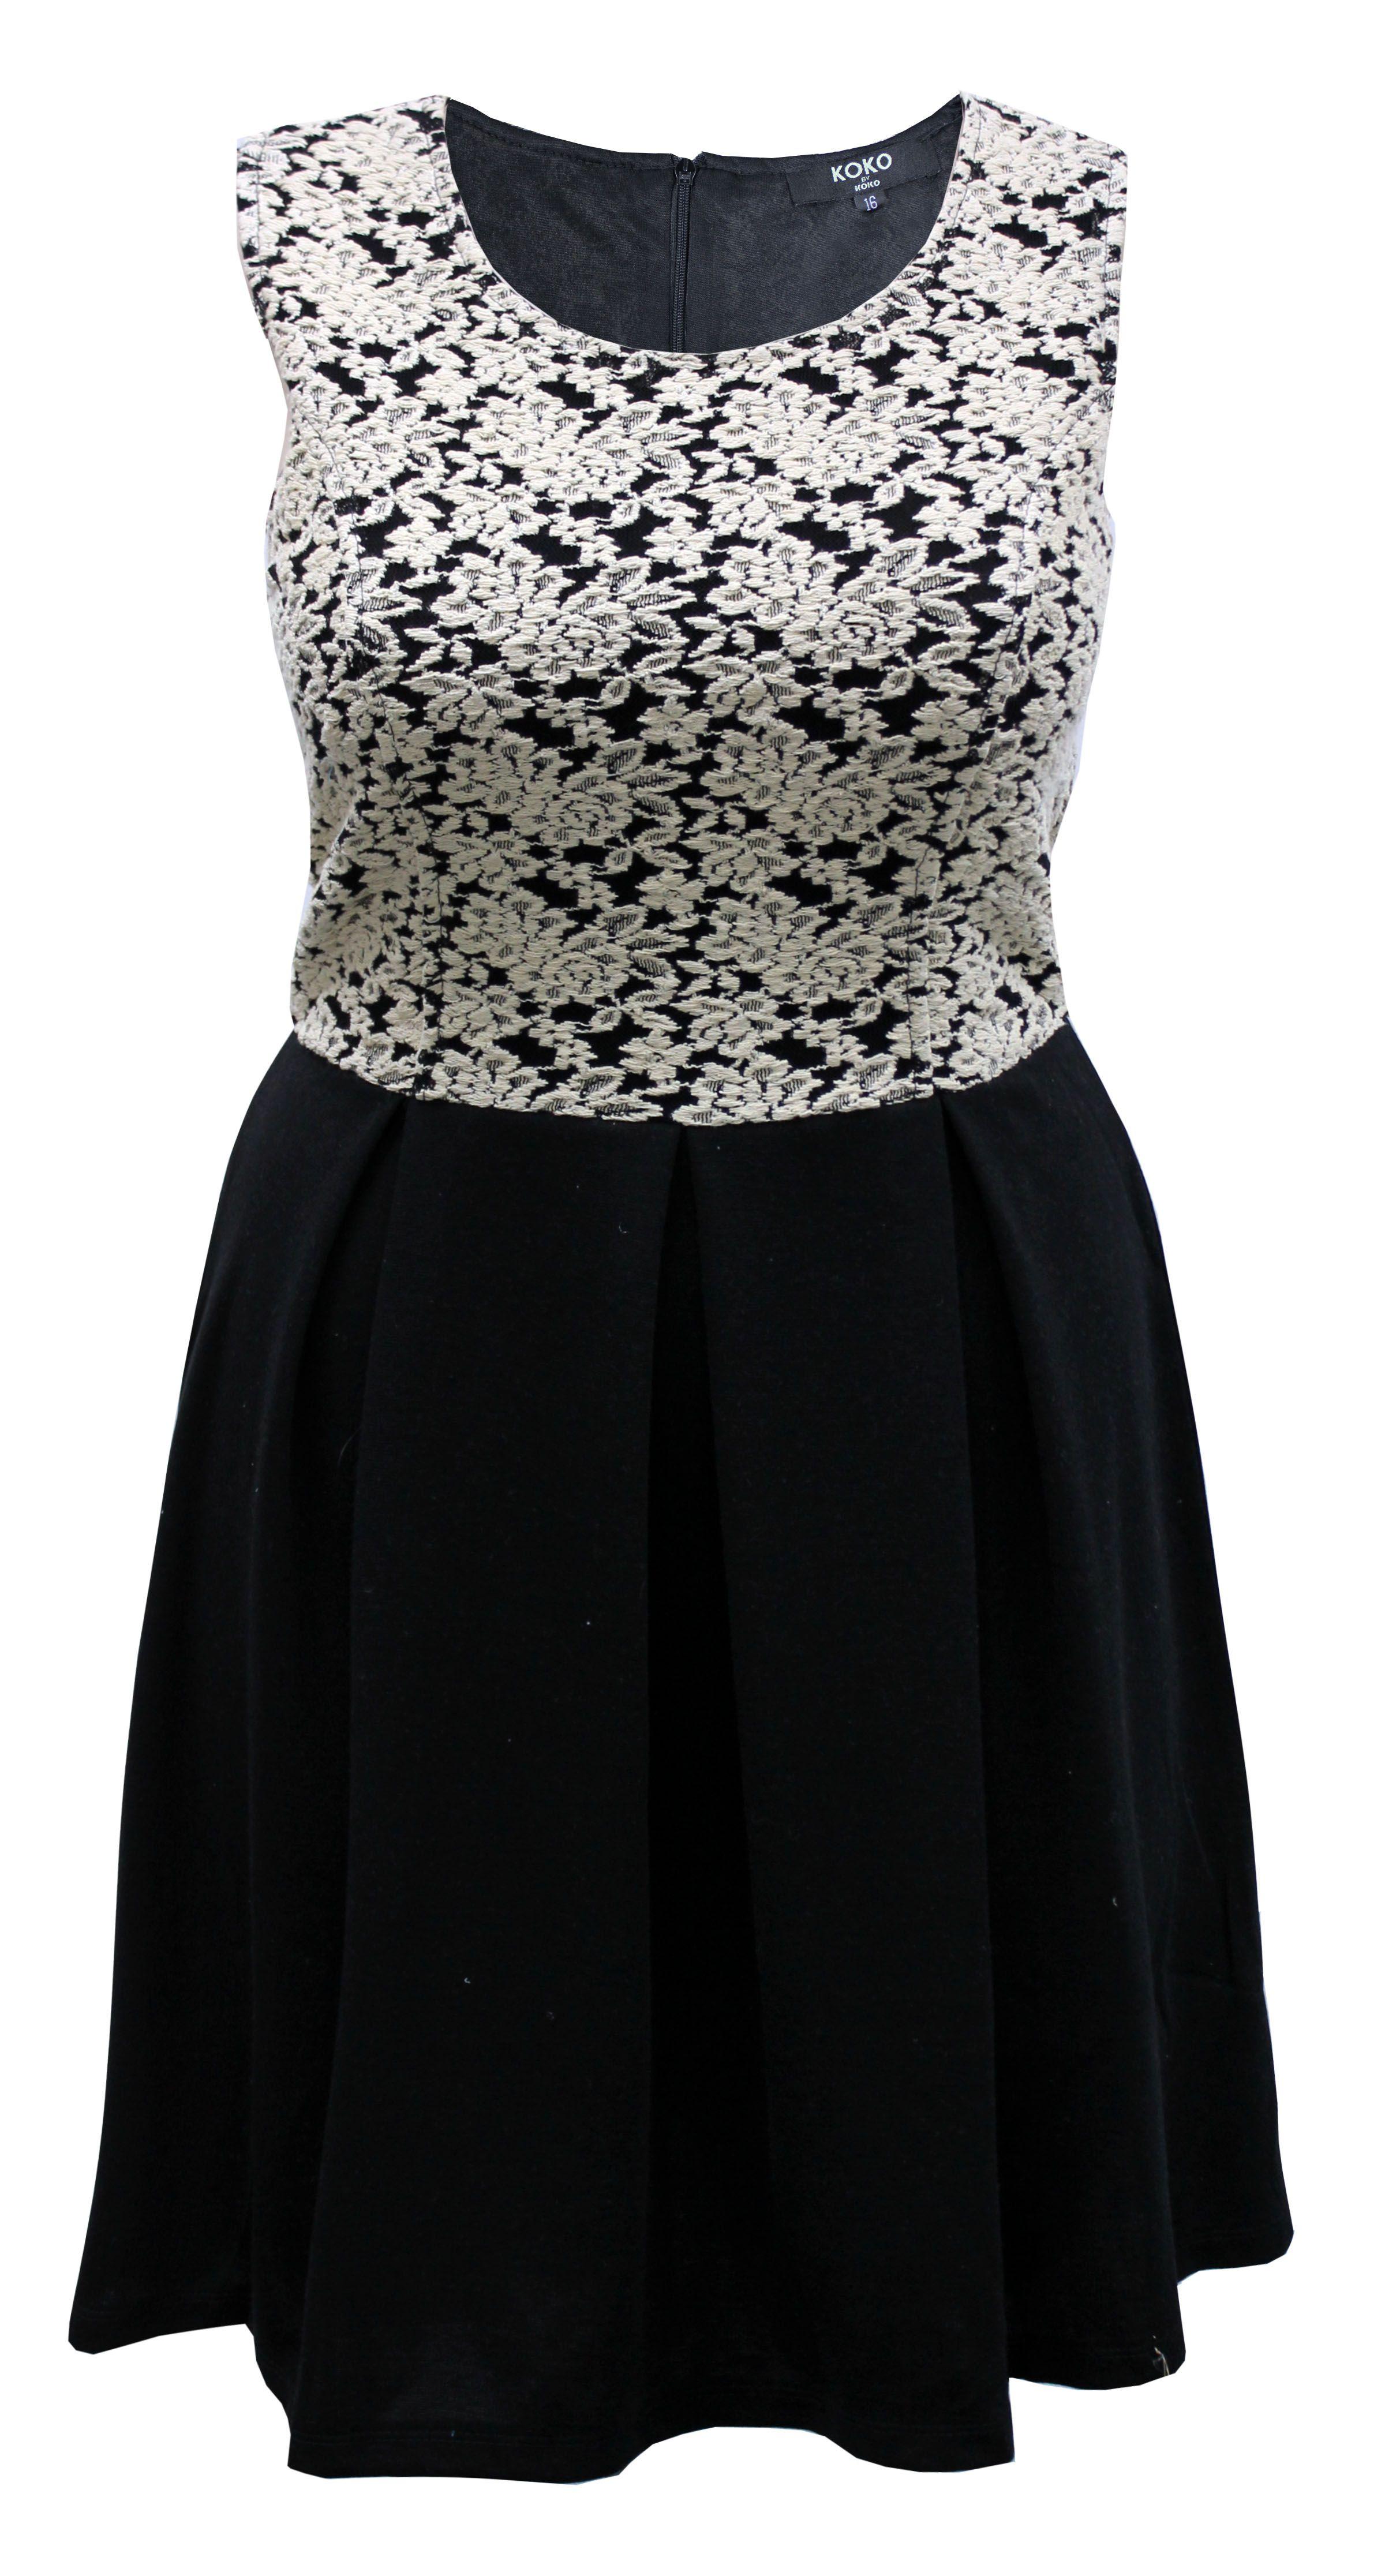 Koko Black Cream Contrast Lace Skater Dress Lace Skater Dress Trendy Plus Size Clothing Plus Size Outfits [ 4464 x 2400 Pixel ]